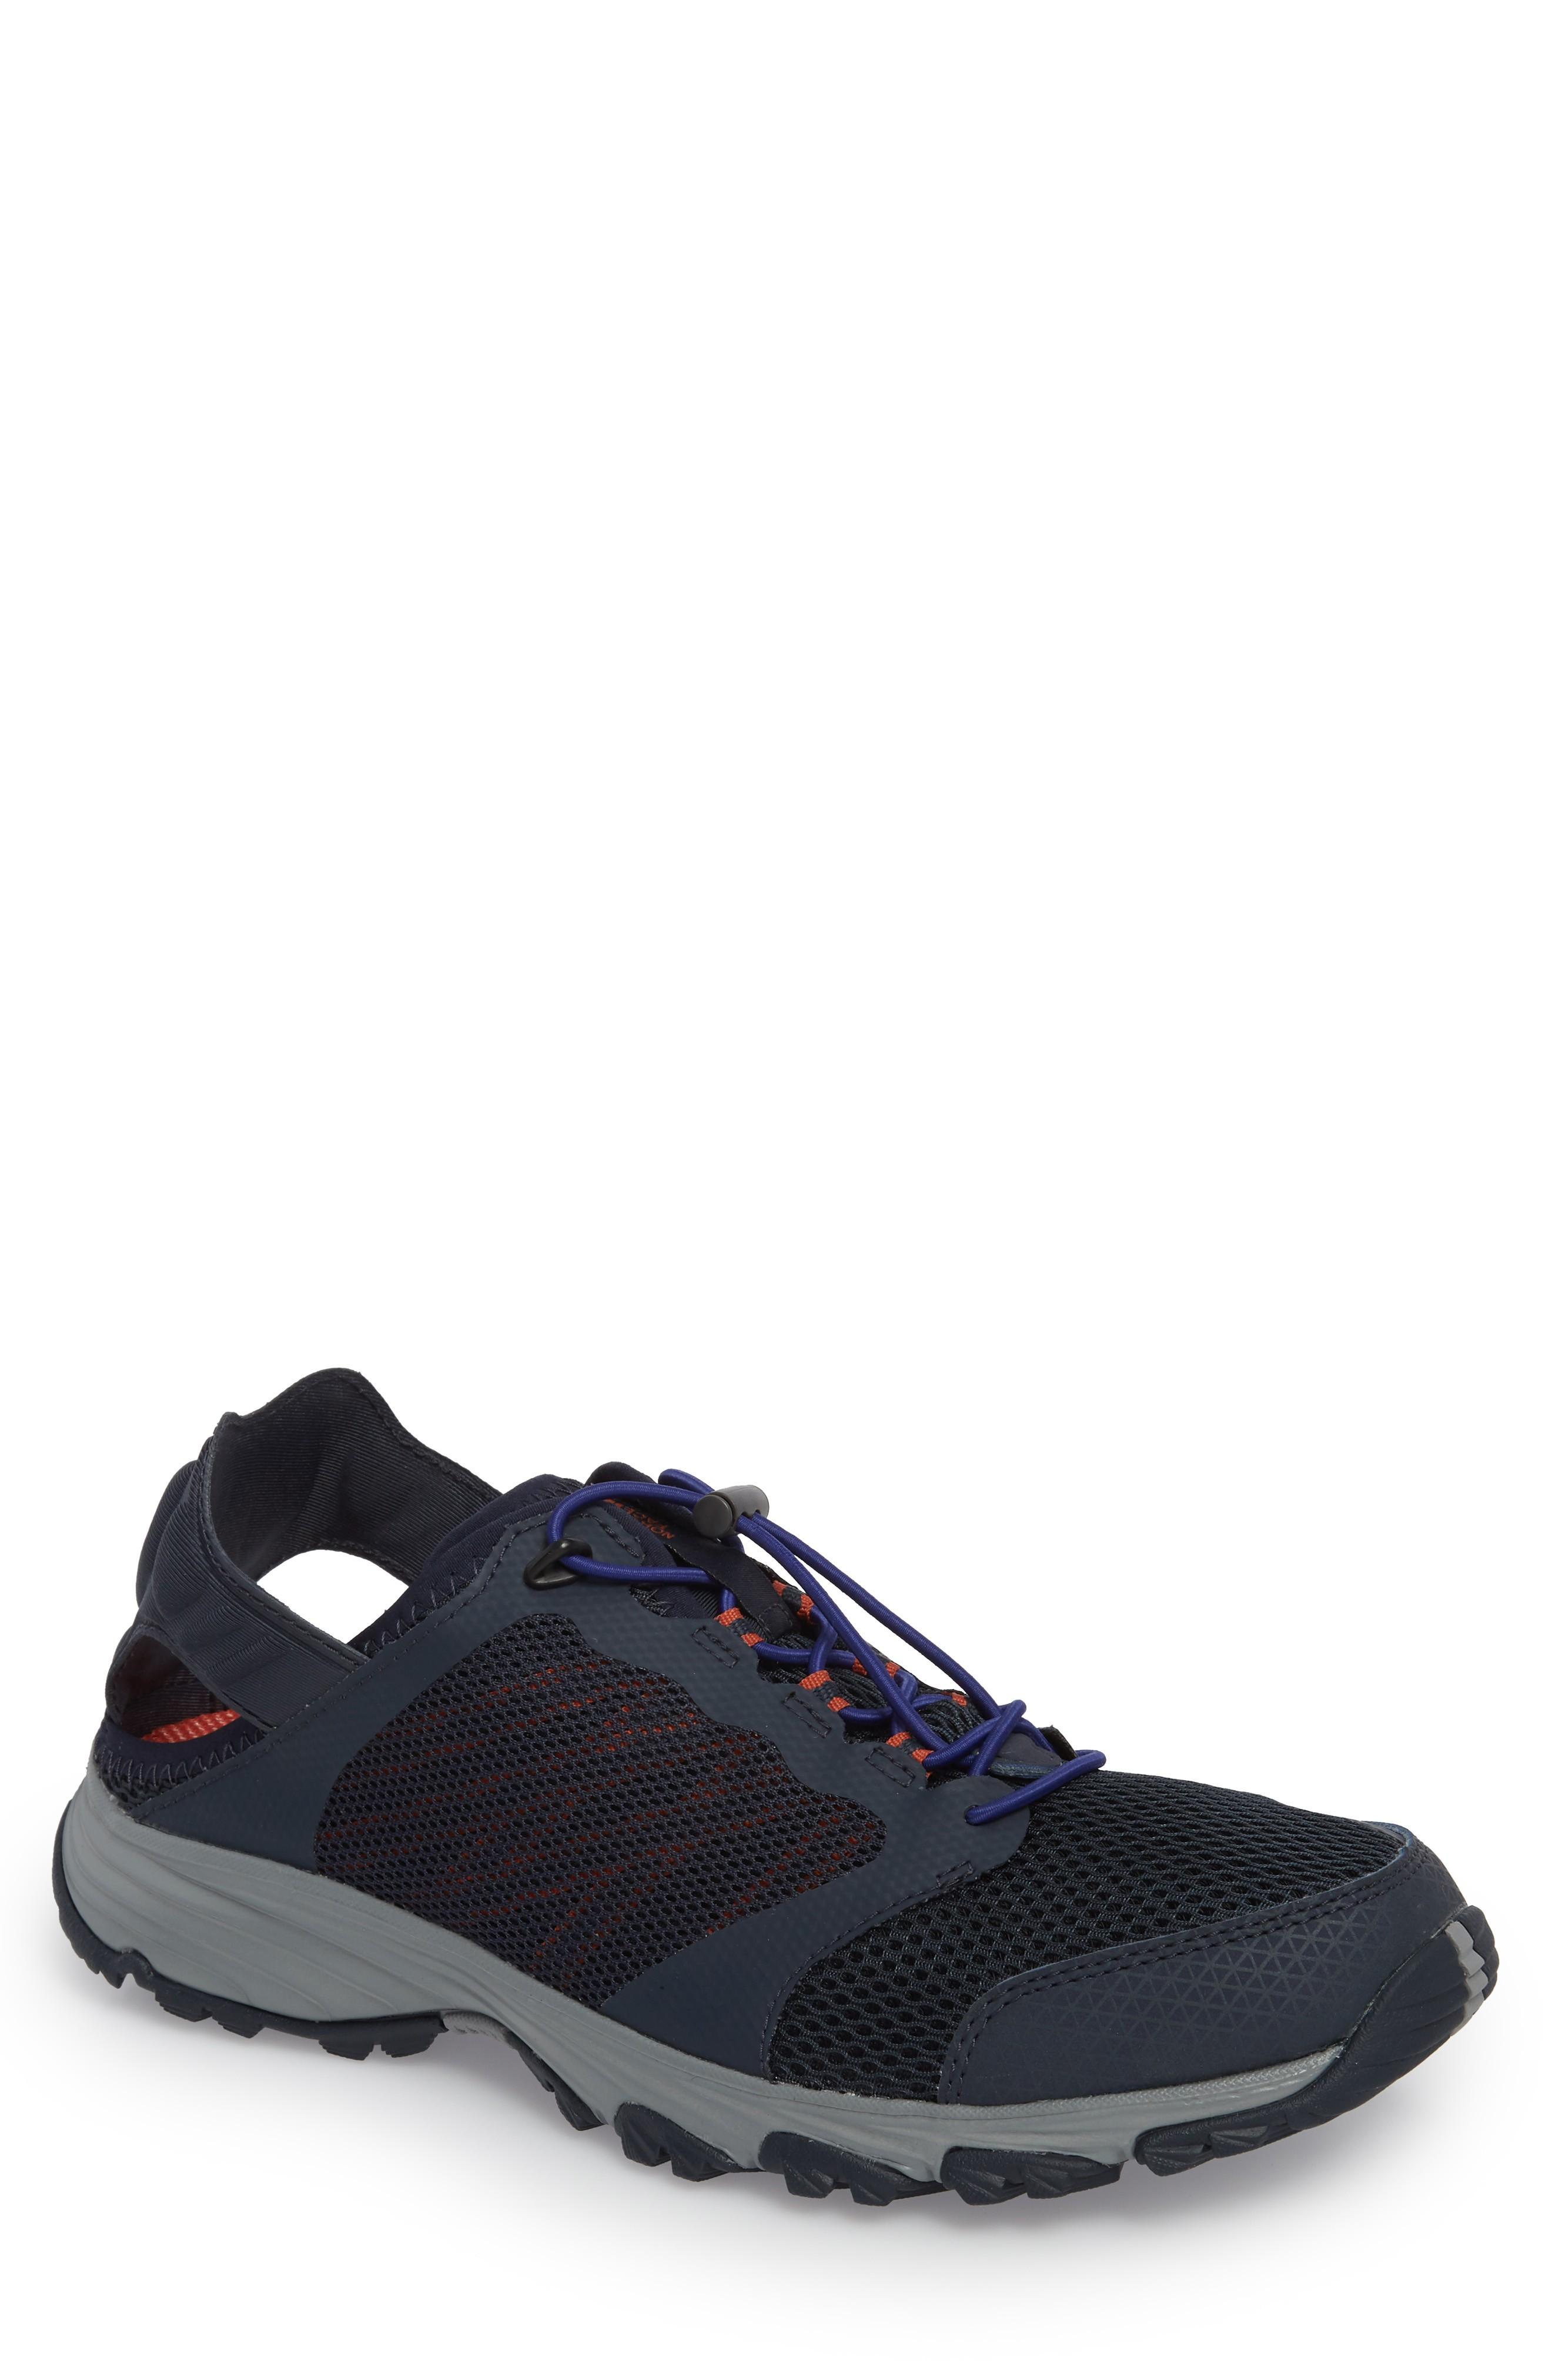 2e2d9ffbe Litewave Amphibious Ii Collapsible Sneaker in Urban Navy/ Brit Blue